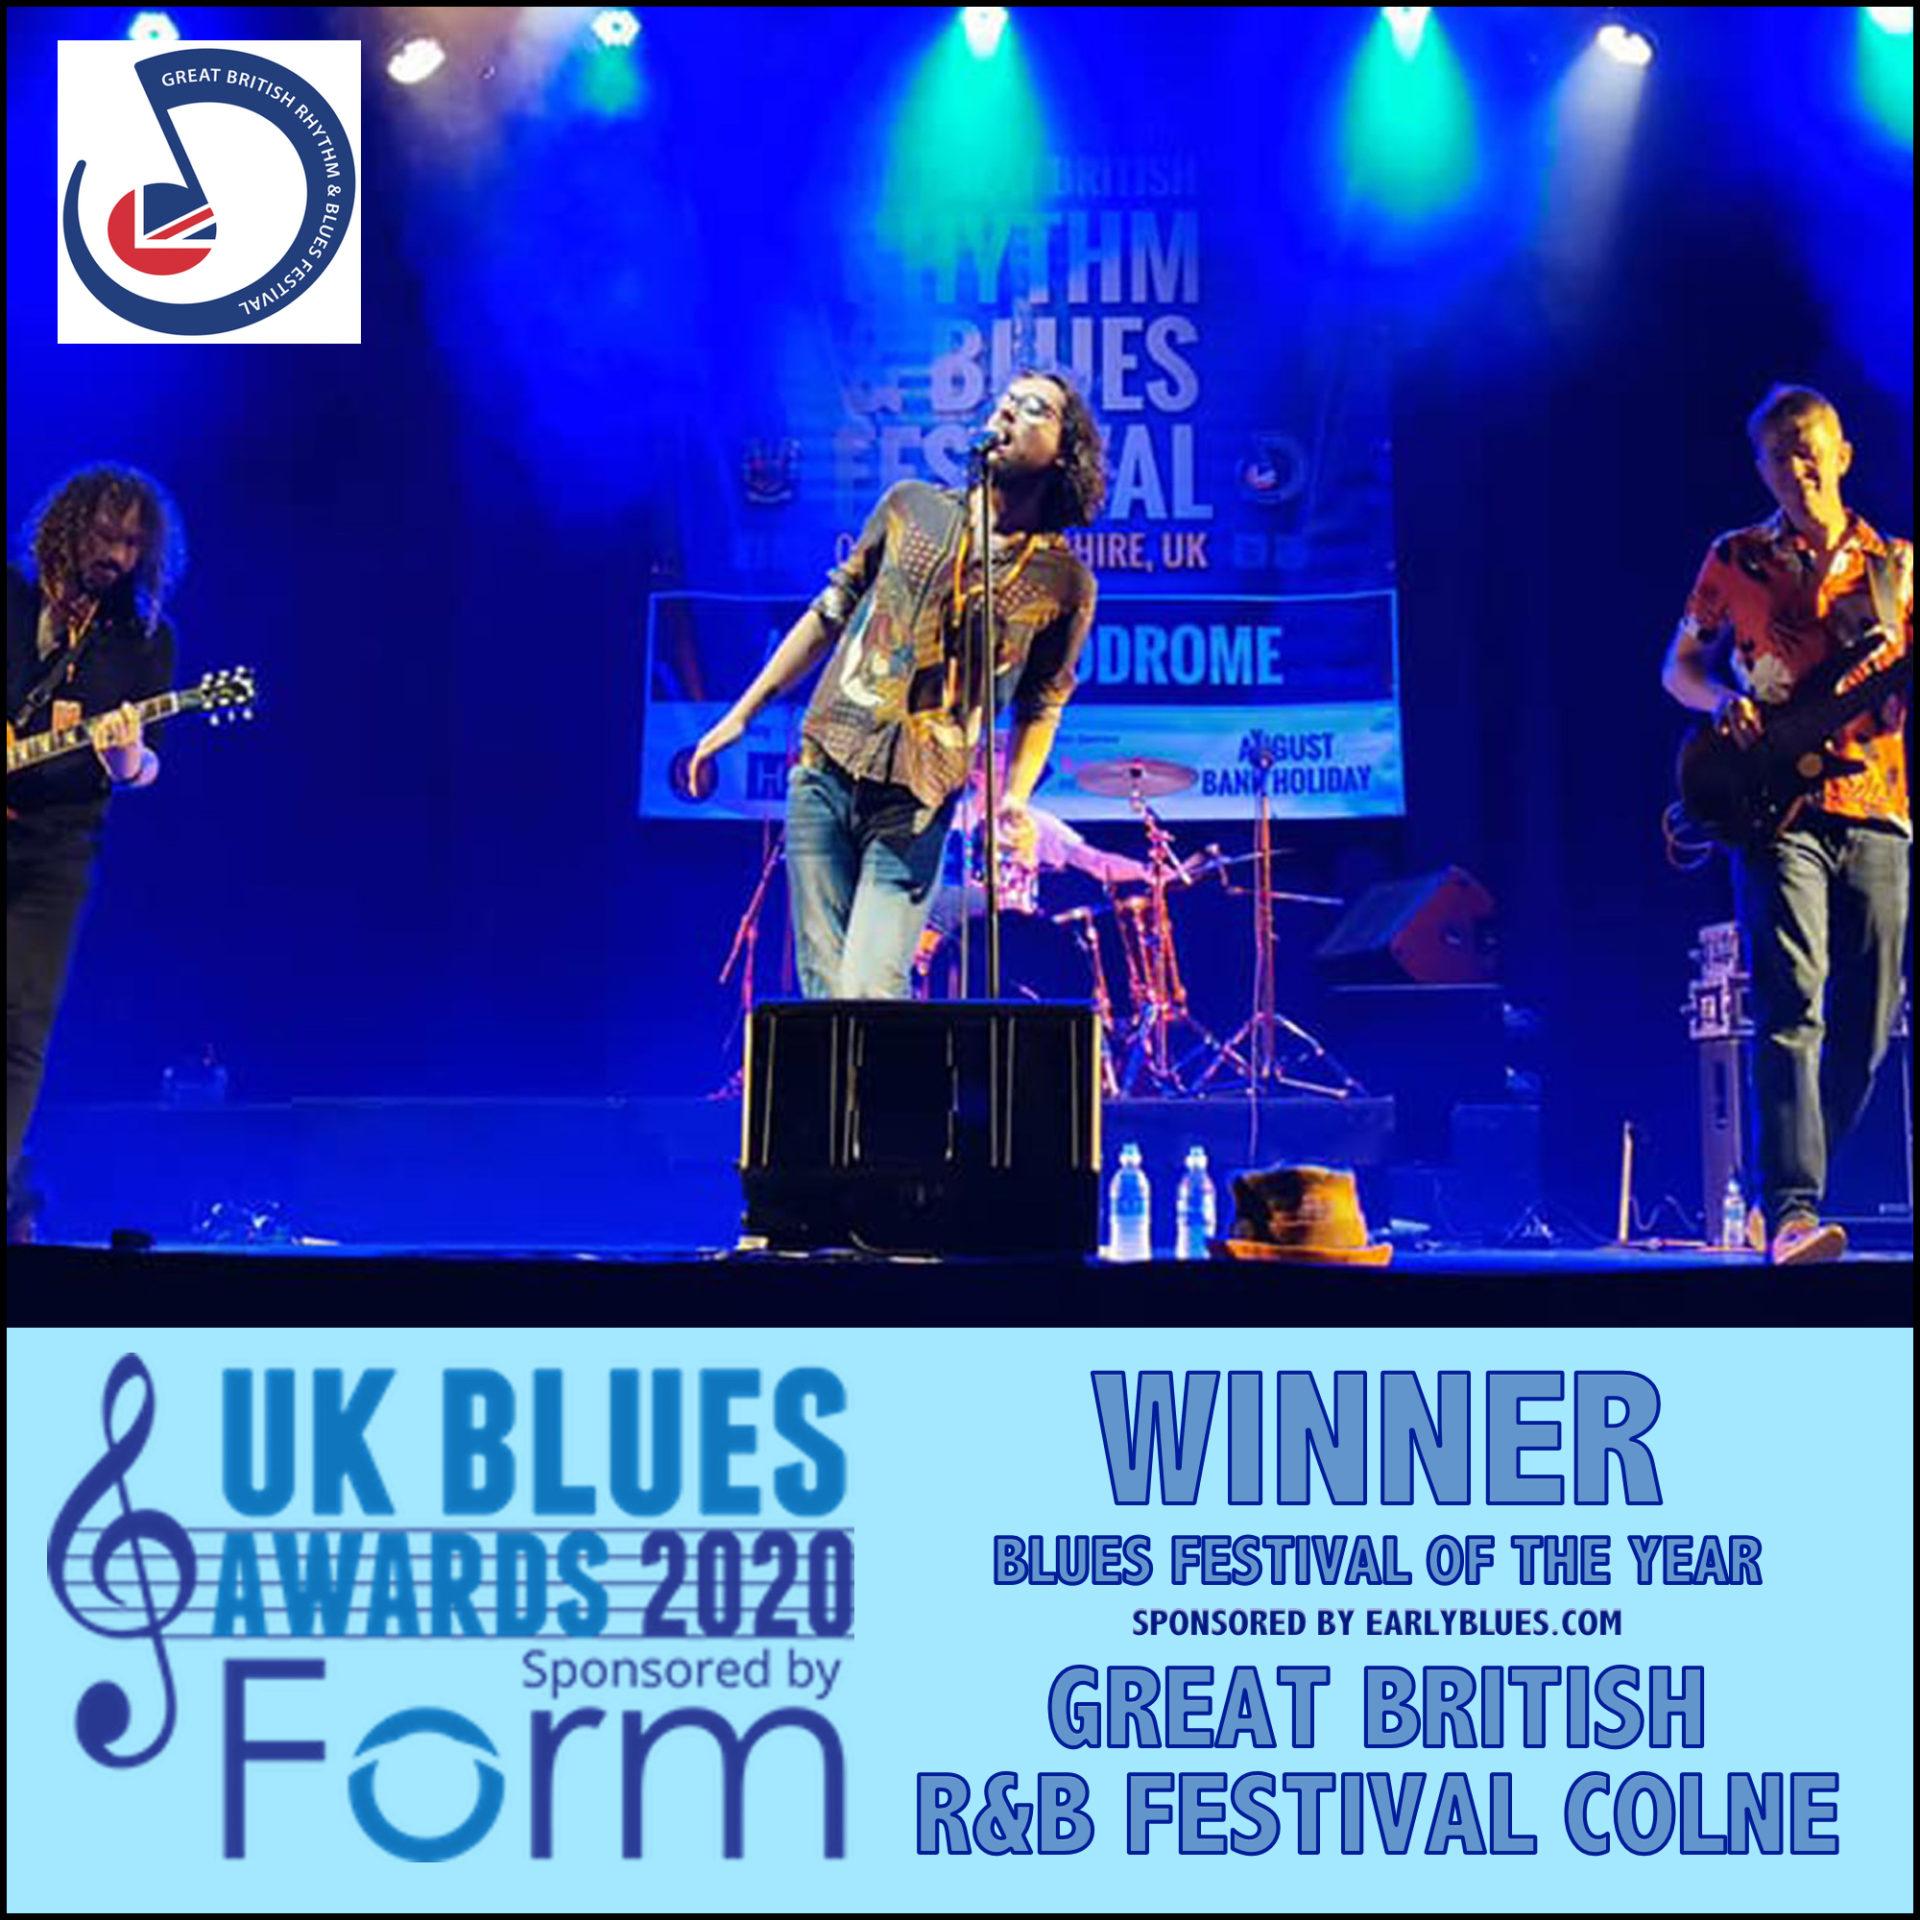 image of 2020 ukblues award winner great british R&B festival colne